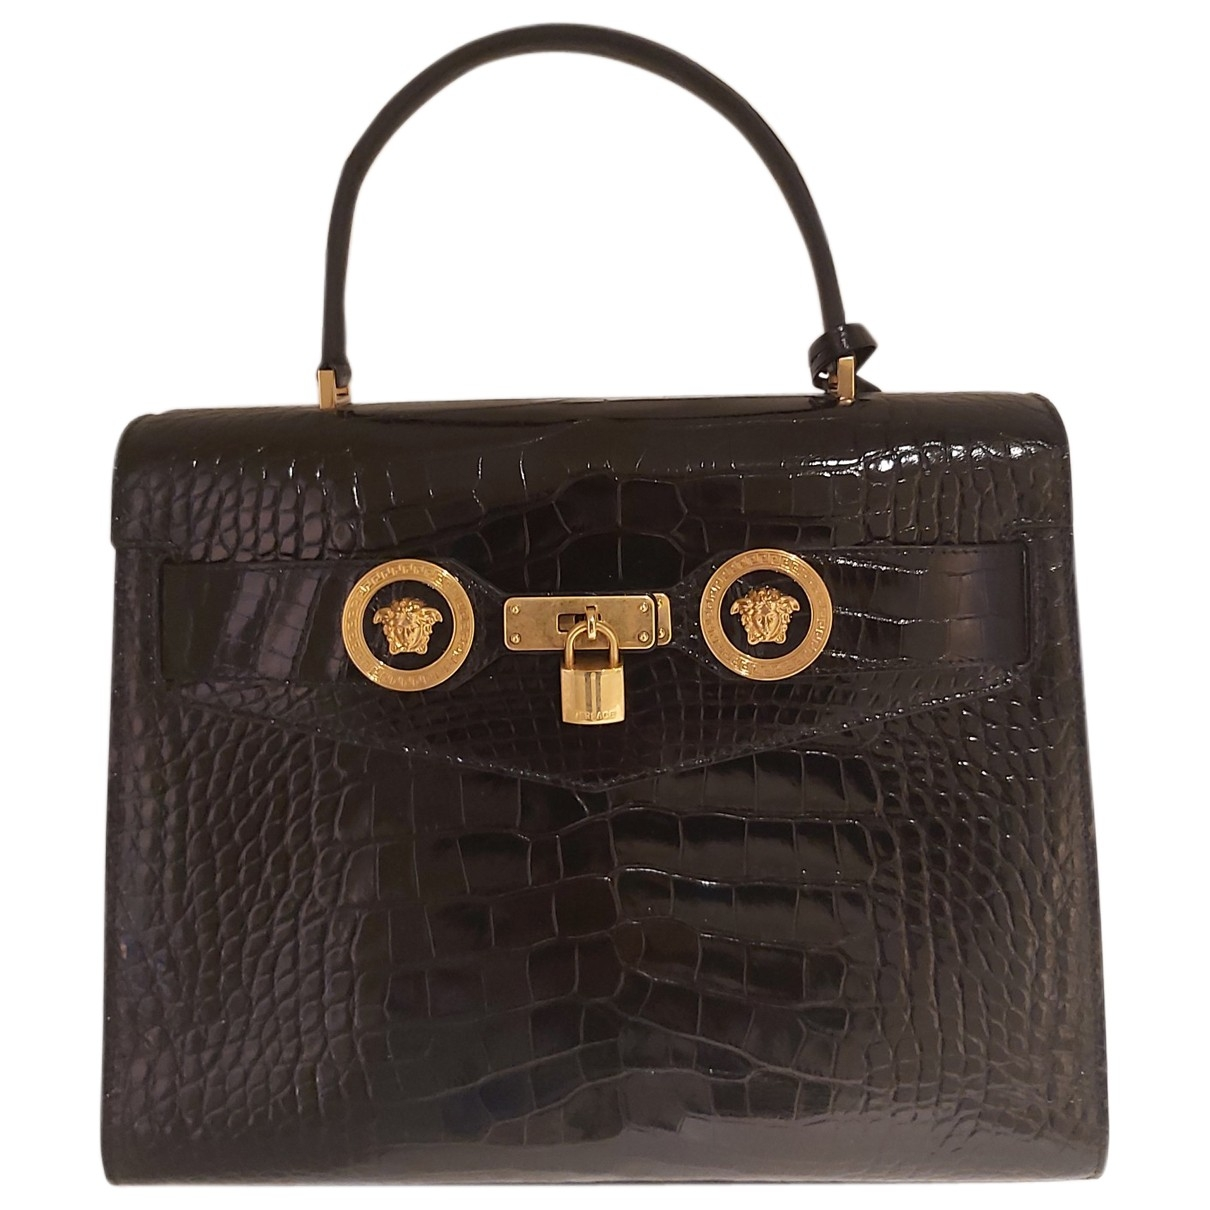 Gianni Versace \N Handtasche in  Schwarz Aligator